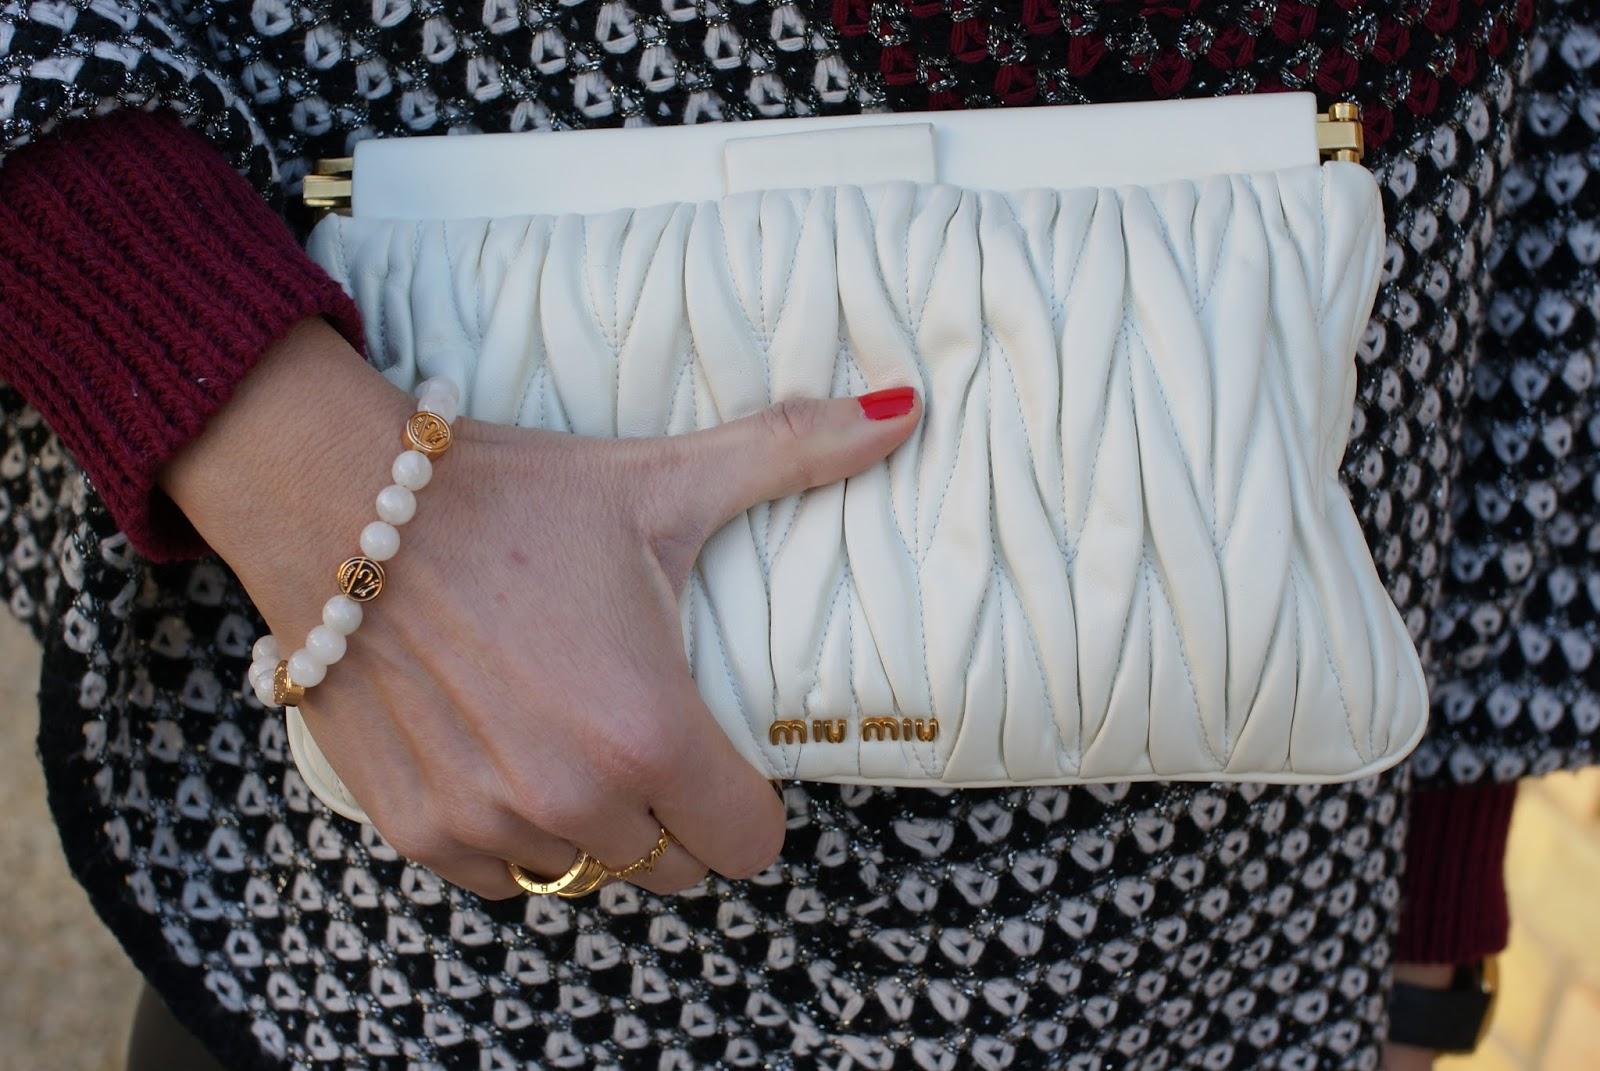 Millelire rosateresa bracciale re e clutch Miu Miu su Fashion and Cookies fashion blog